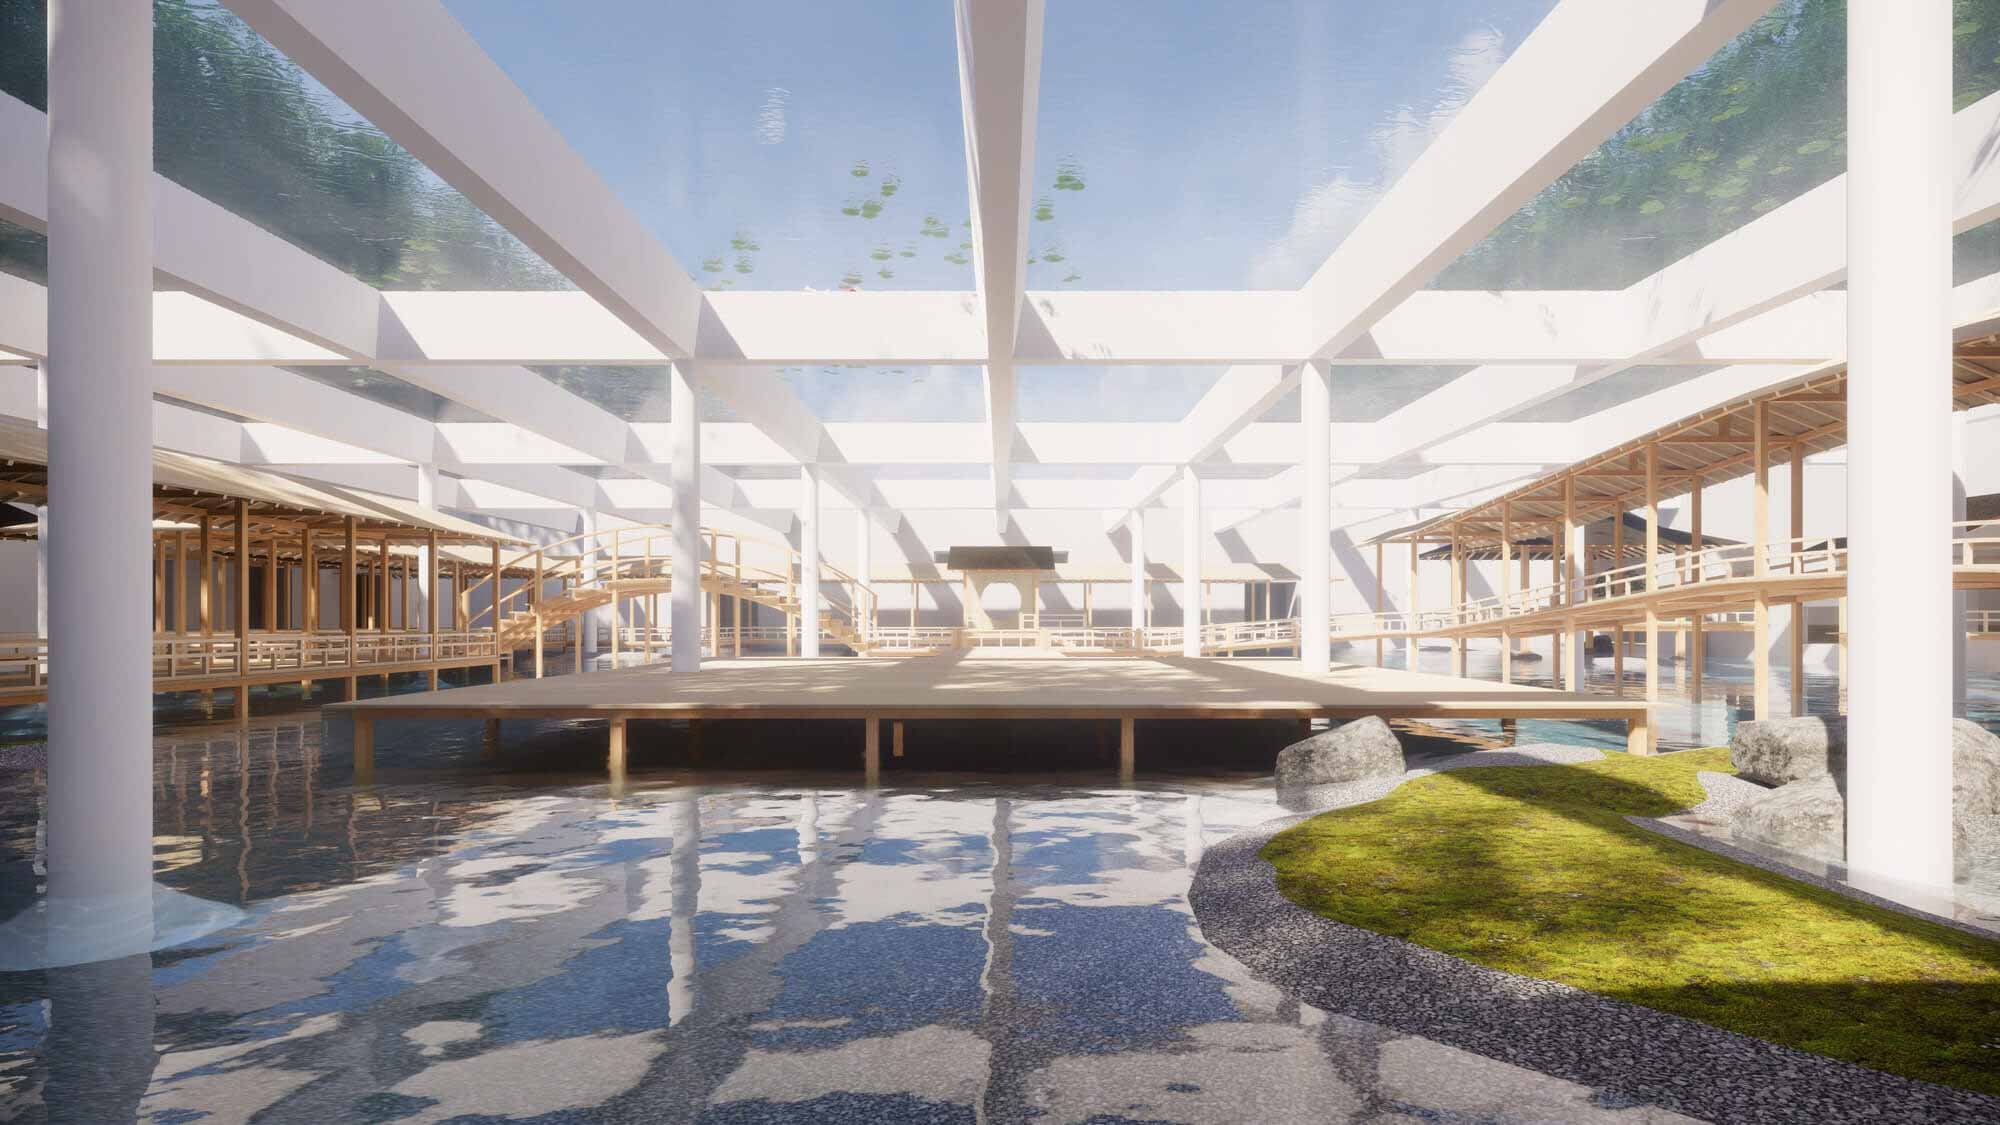 Хироши Самбуичи проектирует расширение цистерн Копенгагена